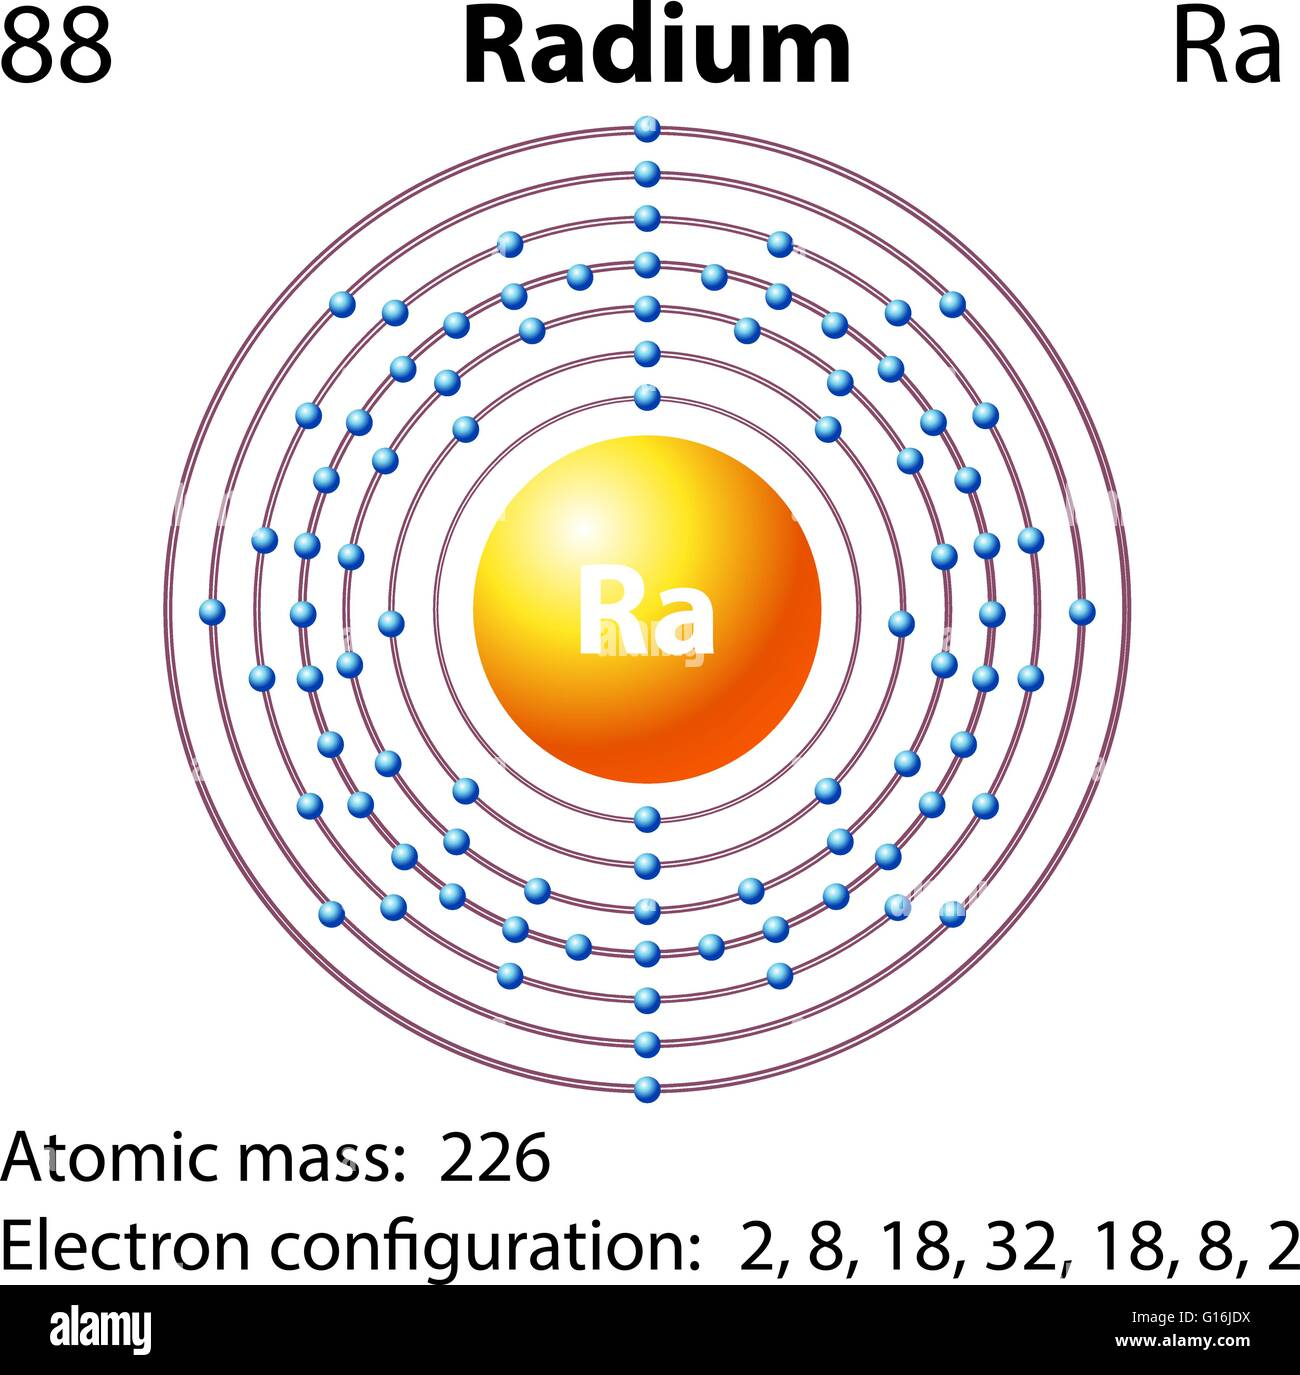 Radium diagram model search for wiring diagrams diagram representation of the element radium illustration stock rh alamy com orbital diagram of radon electron ccuart Gallery